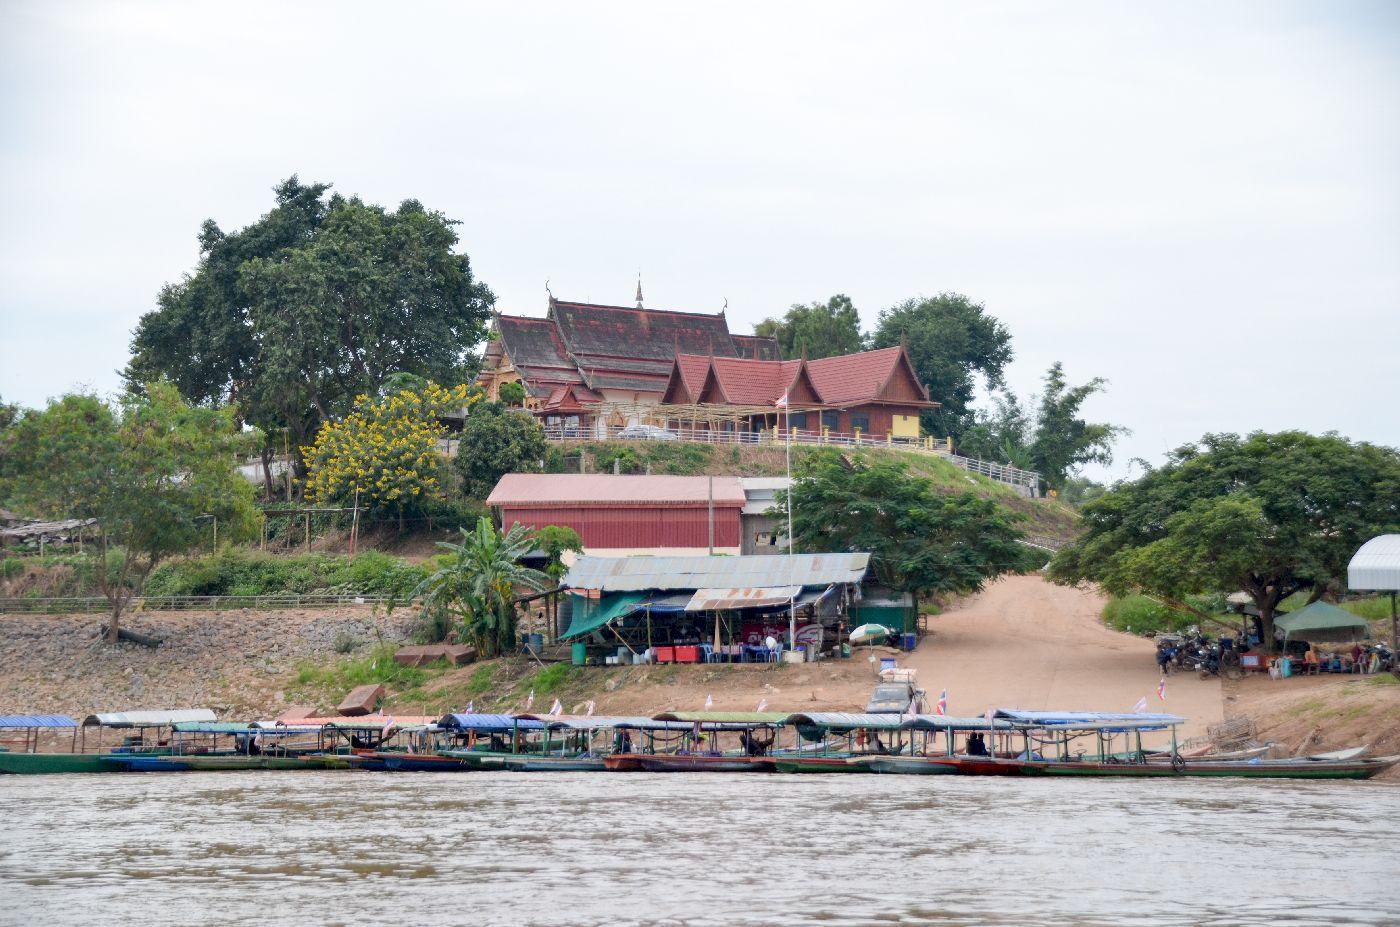 https://blogvoyages.fr/wp-content/uploads/2018/01/Mekong-laos-0183.jpg